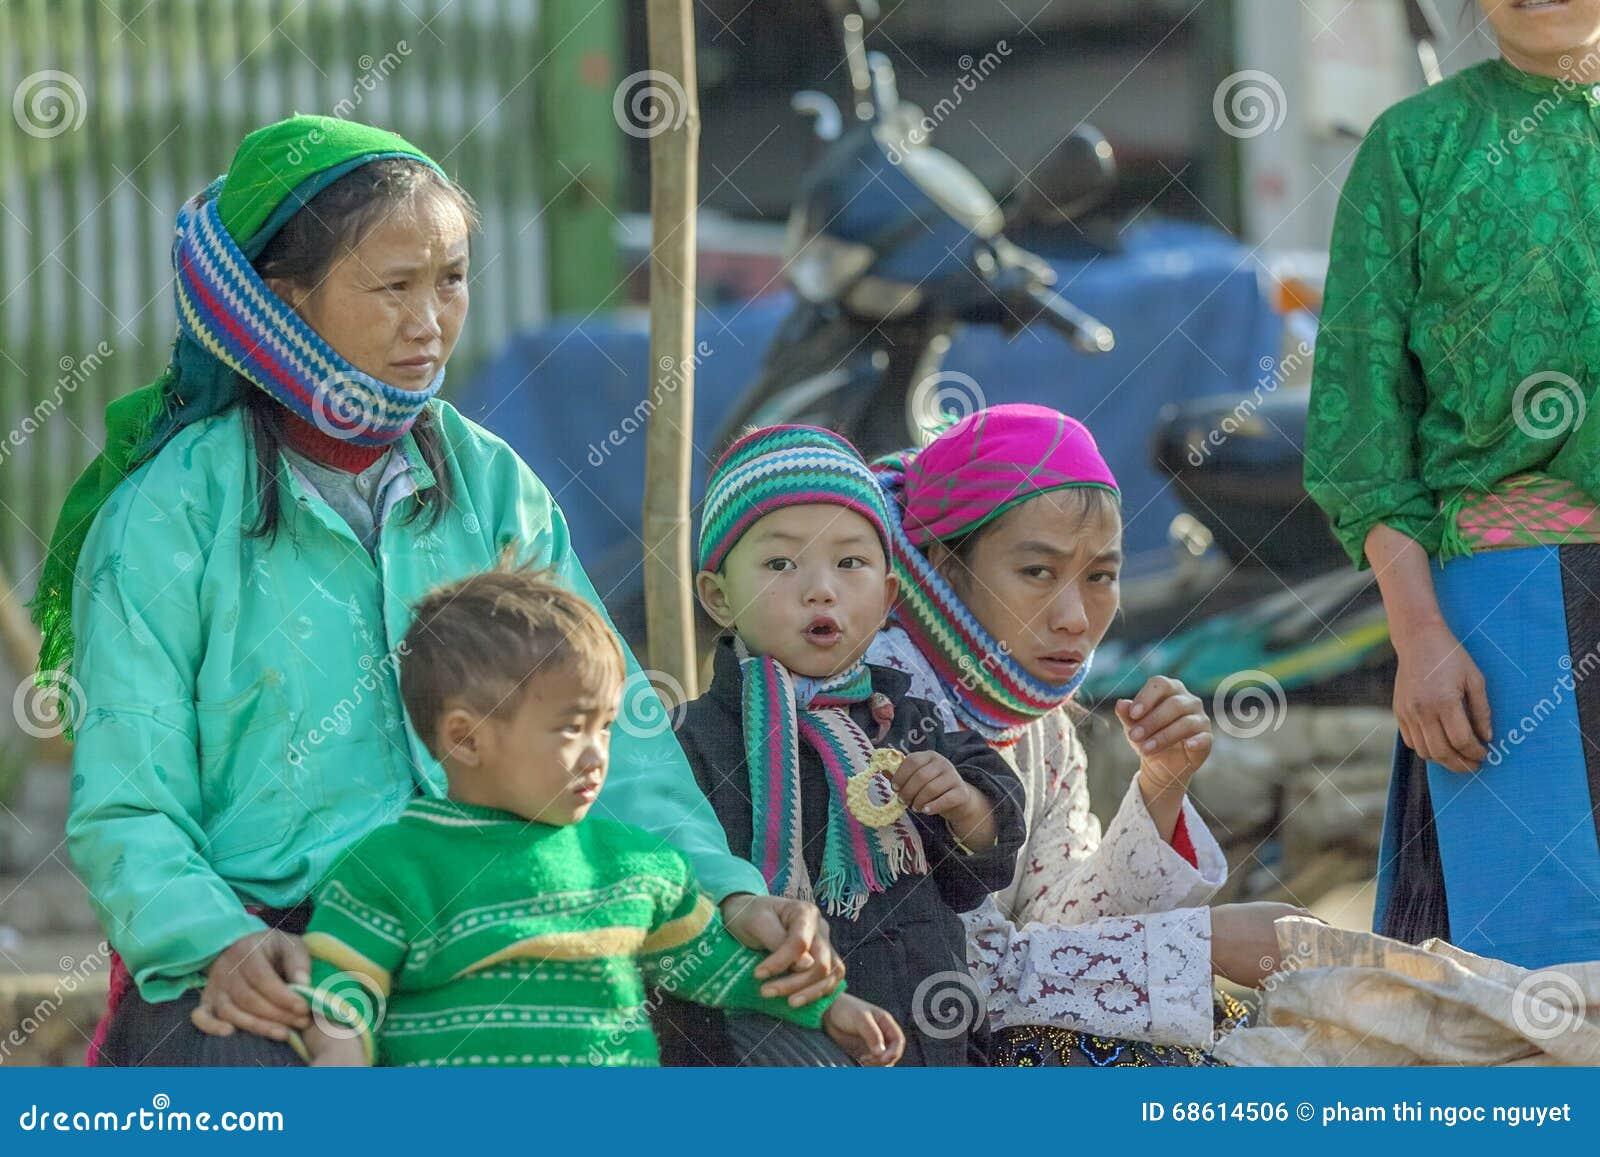 Ethnic Minority People Editorial Photo - Image: 68614506